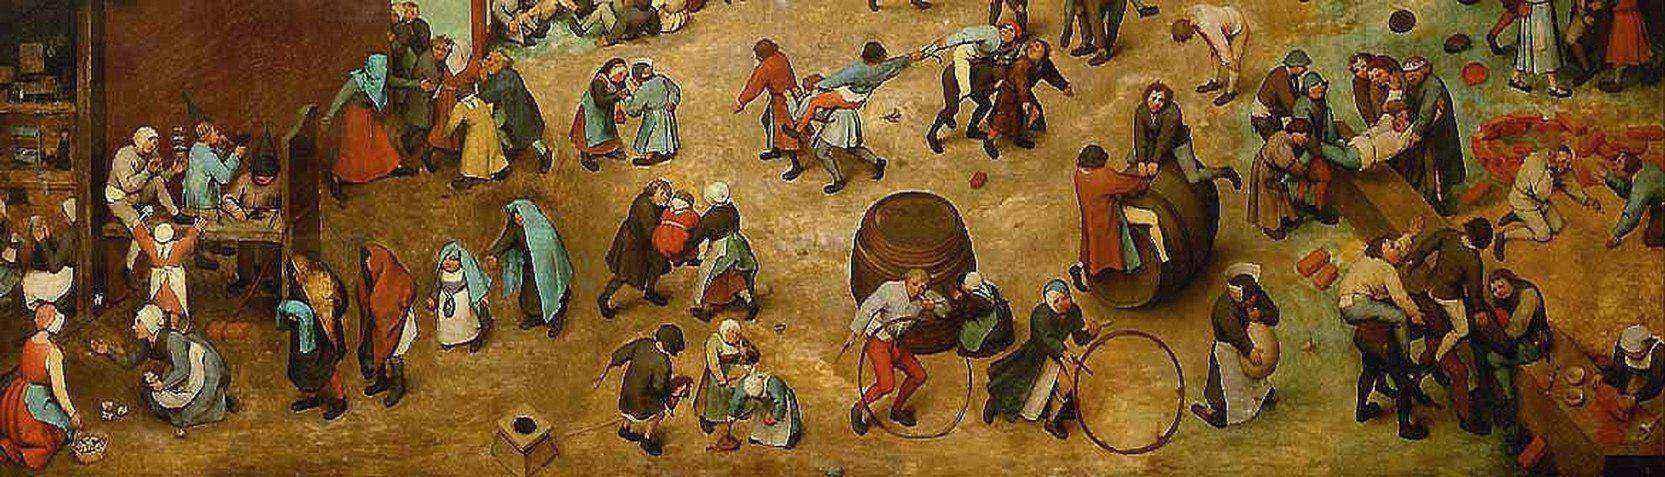 Artistes - Pieter Bruegel der Jüngere